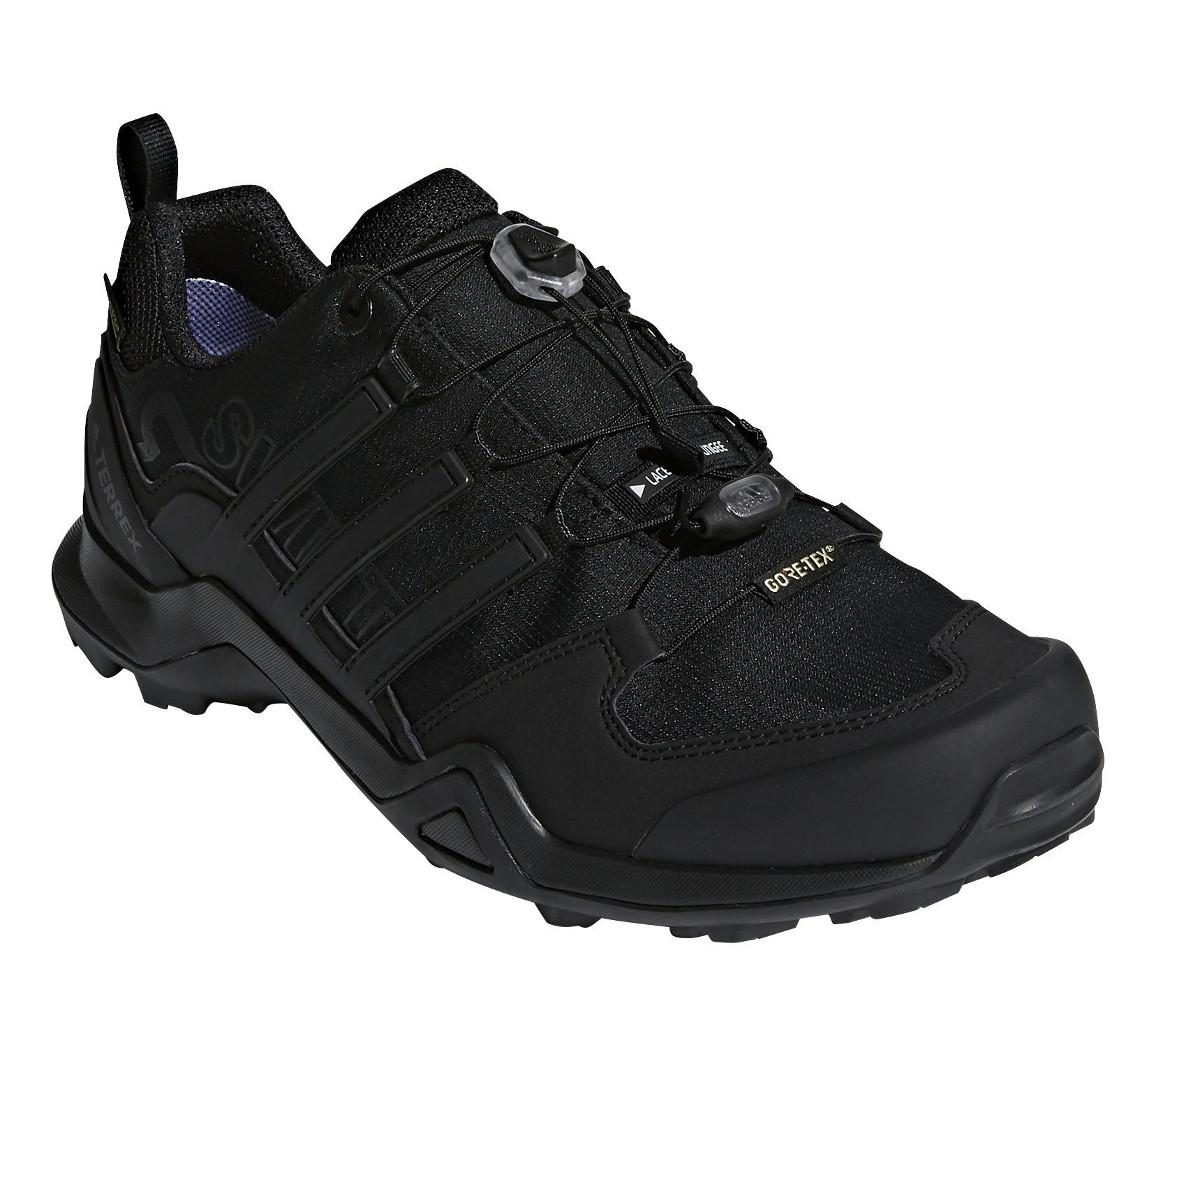 Adidas Men's Terrex Swift R2 Gtx Hiking Boots - Black, 12.5